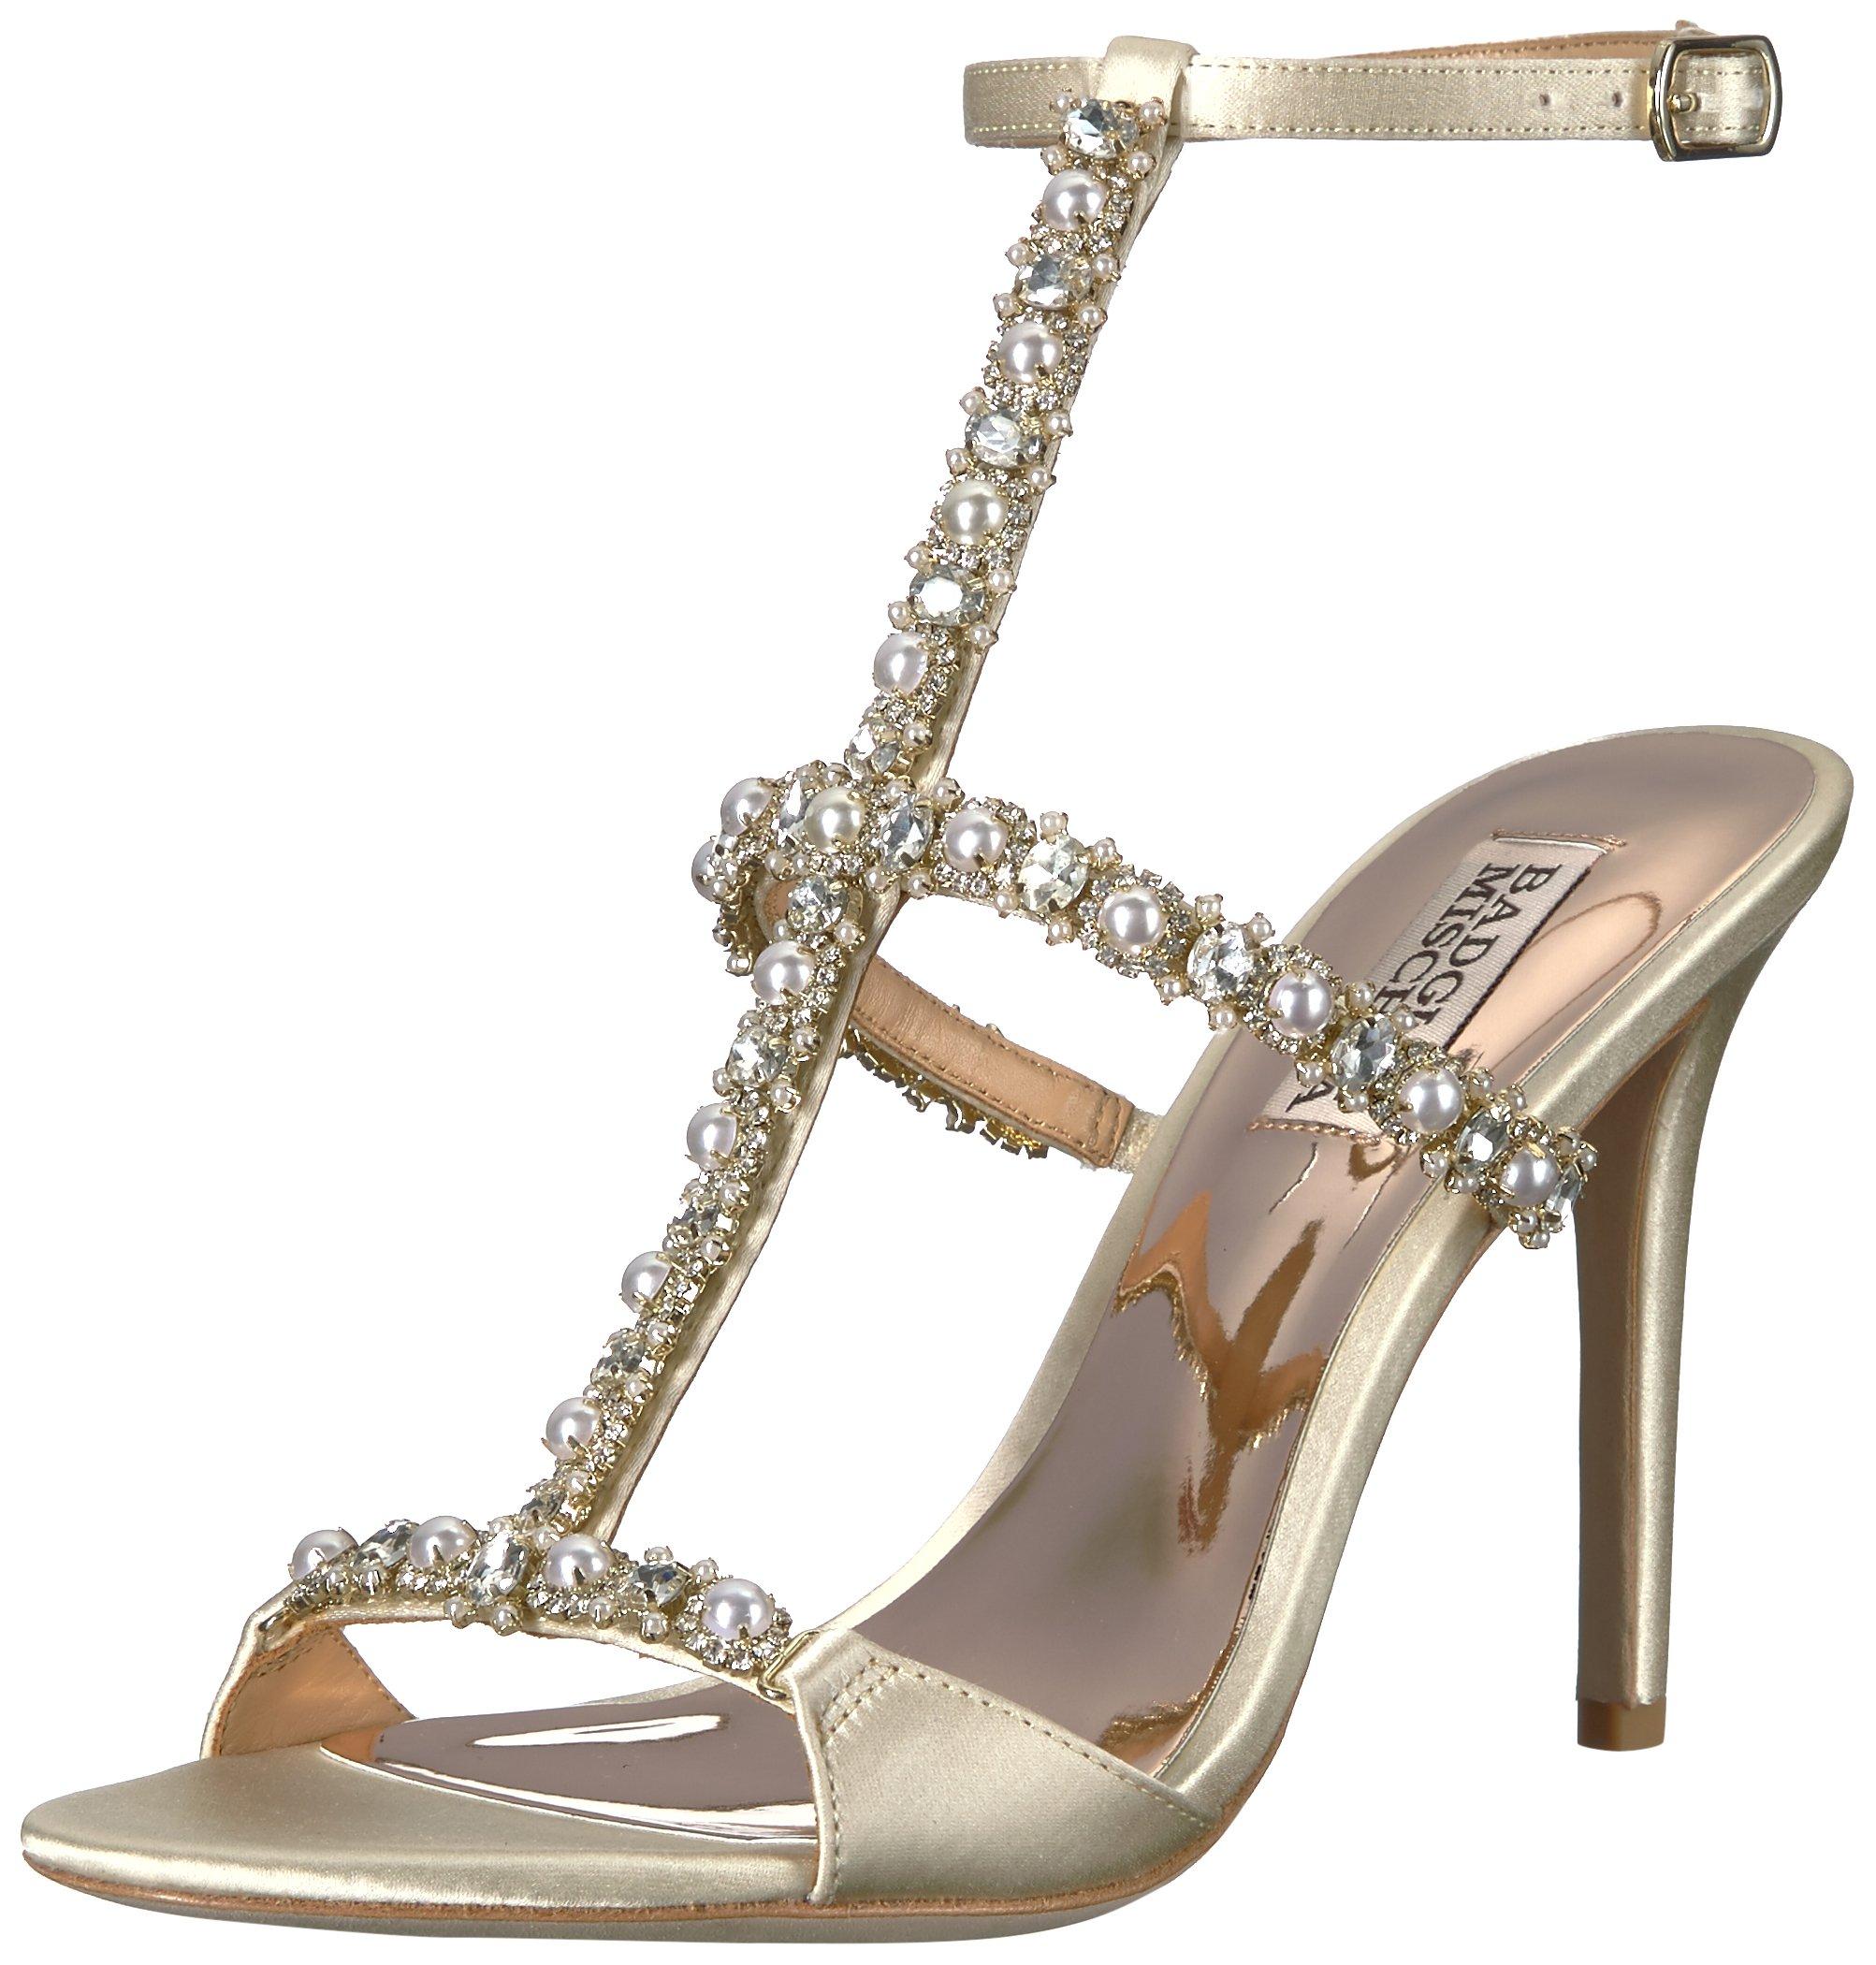 Badgley Mischka Women's Yuliana Heeled Sandal, Ivory, 6 M US